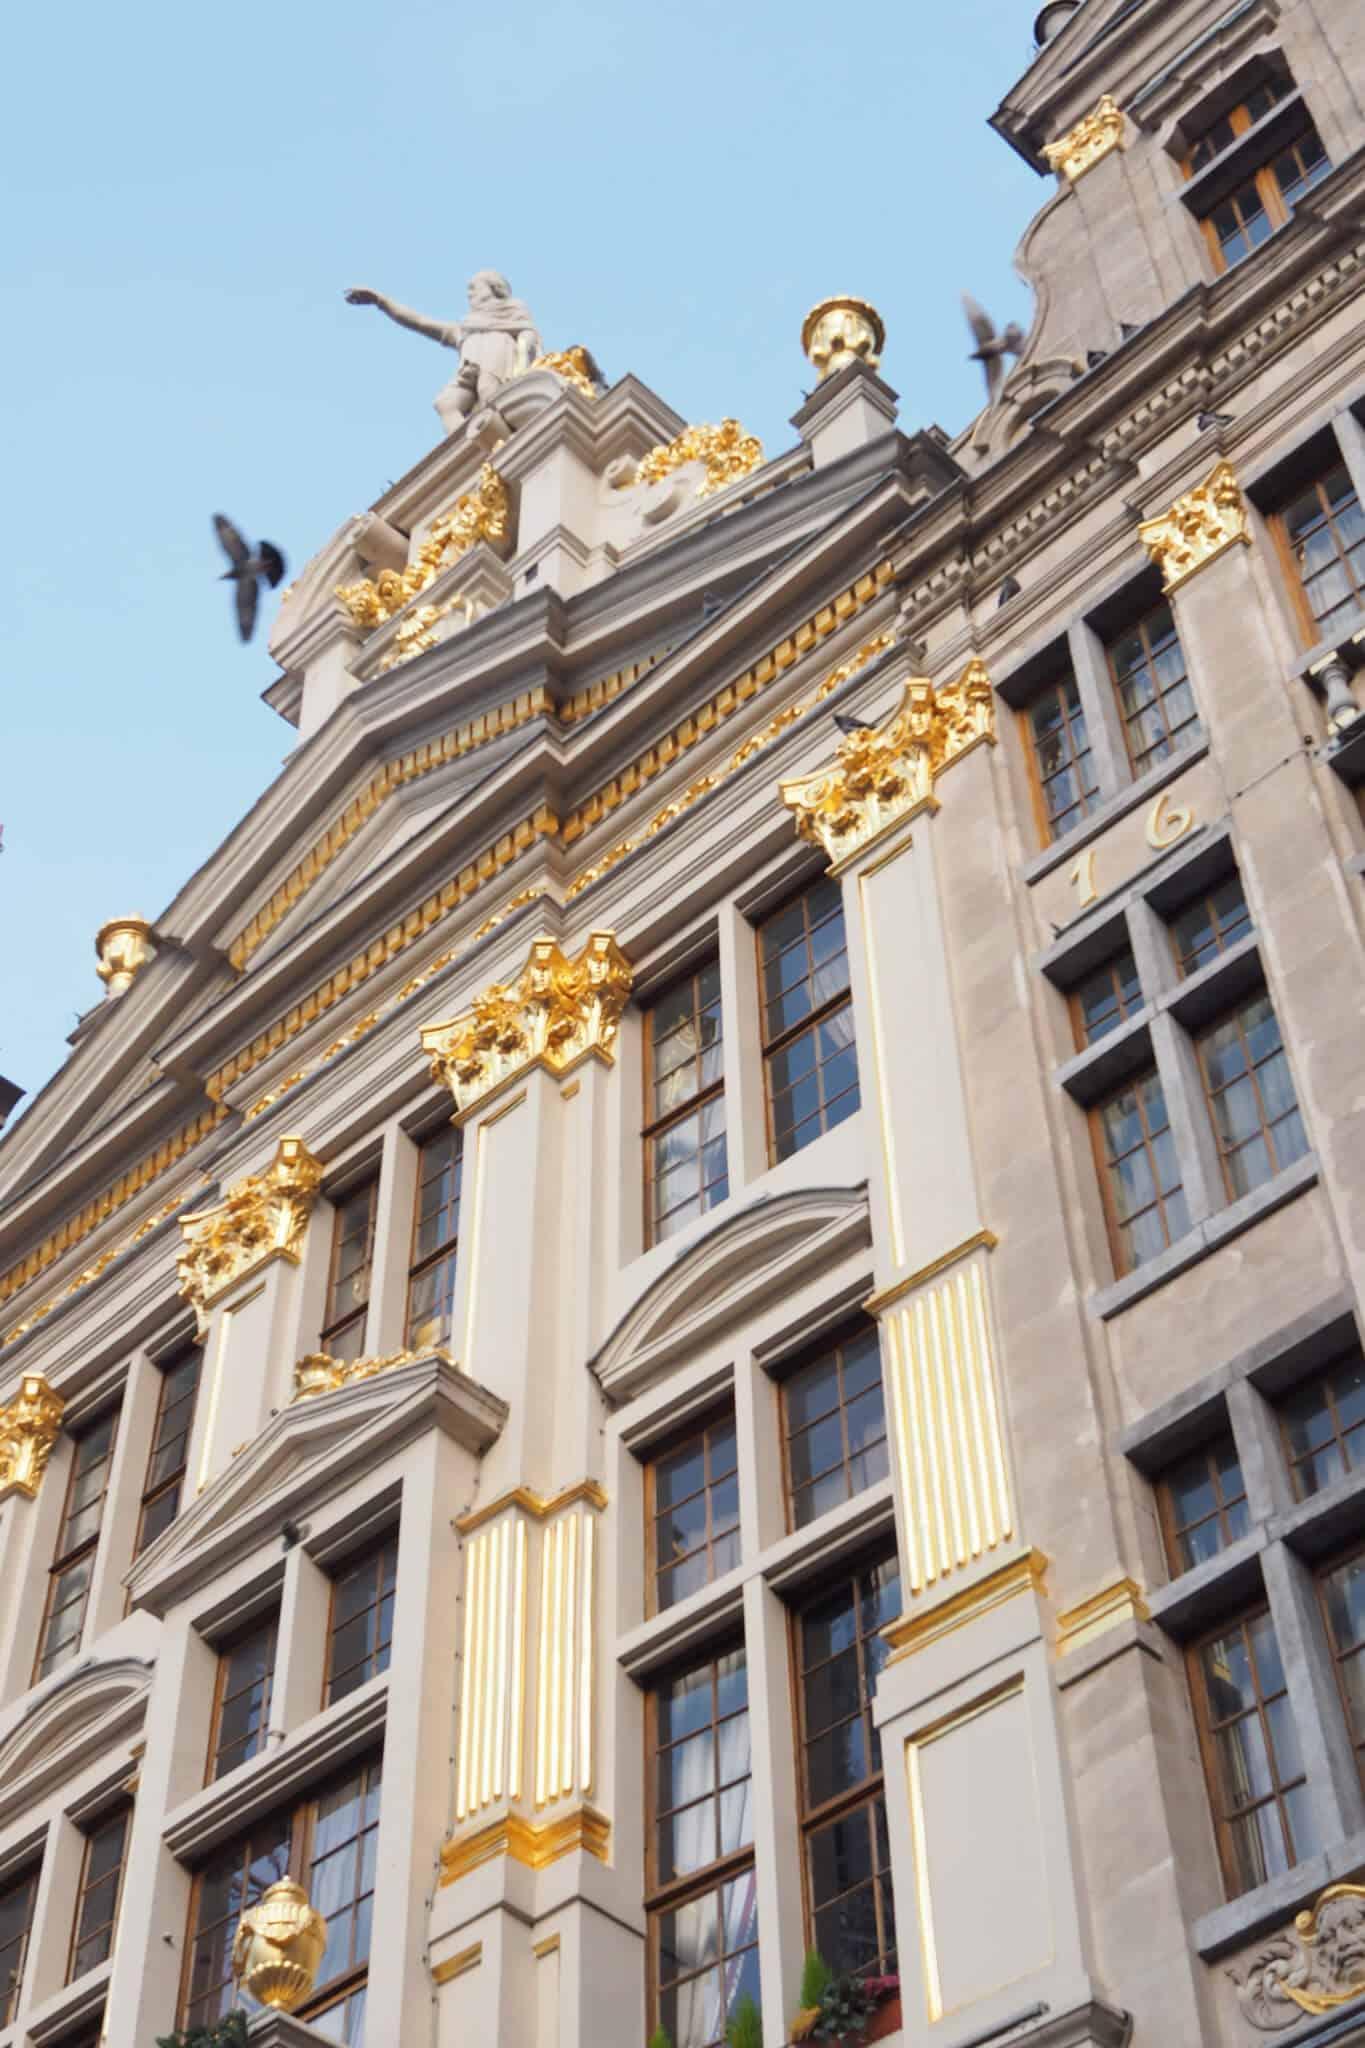 gothic-architecture-detail